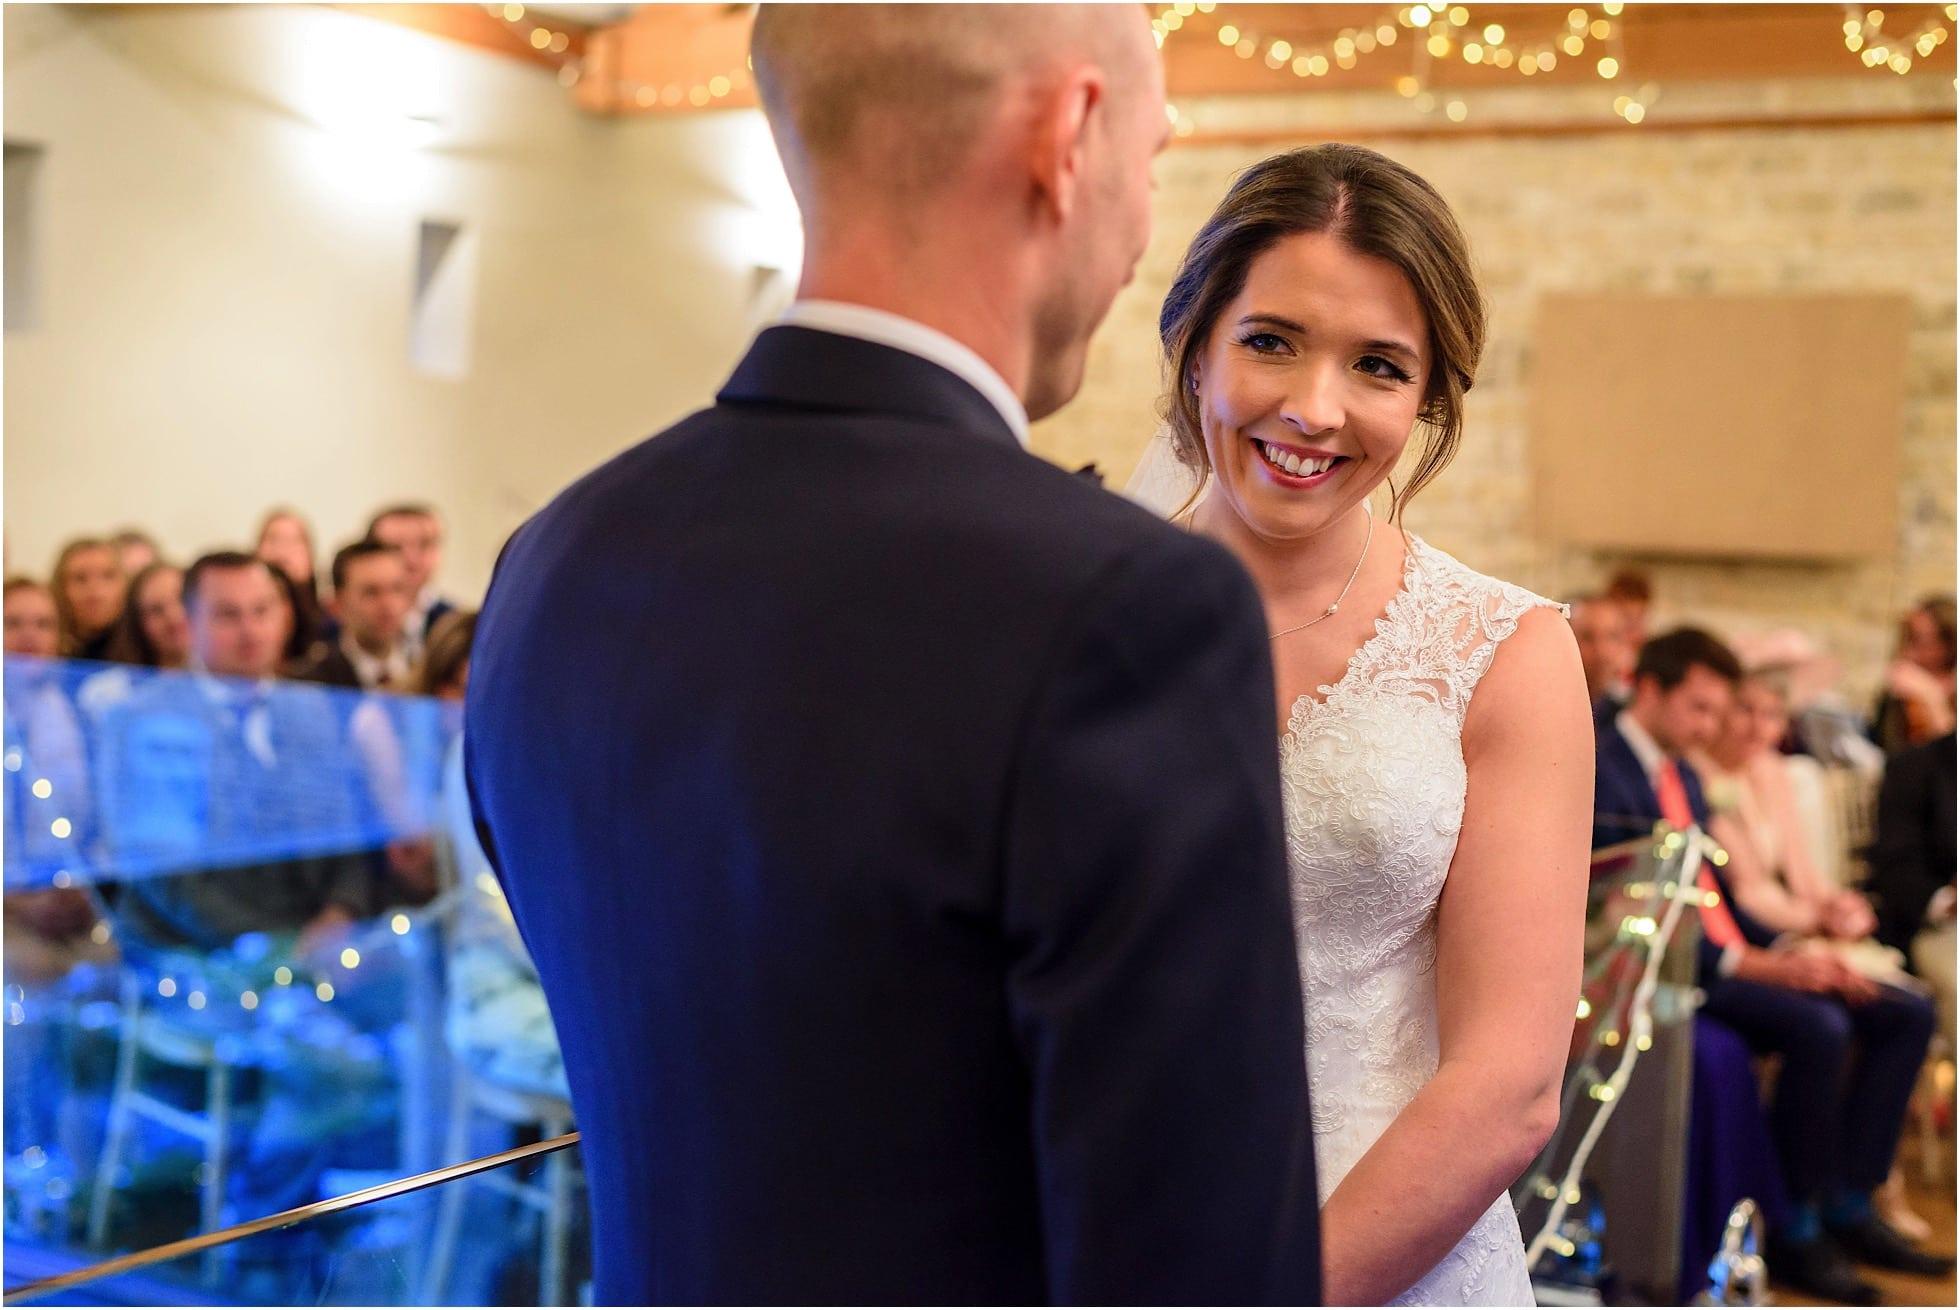 Beautiful Yorkshire bride